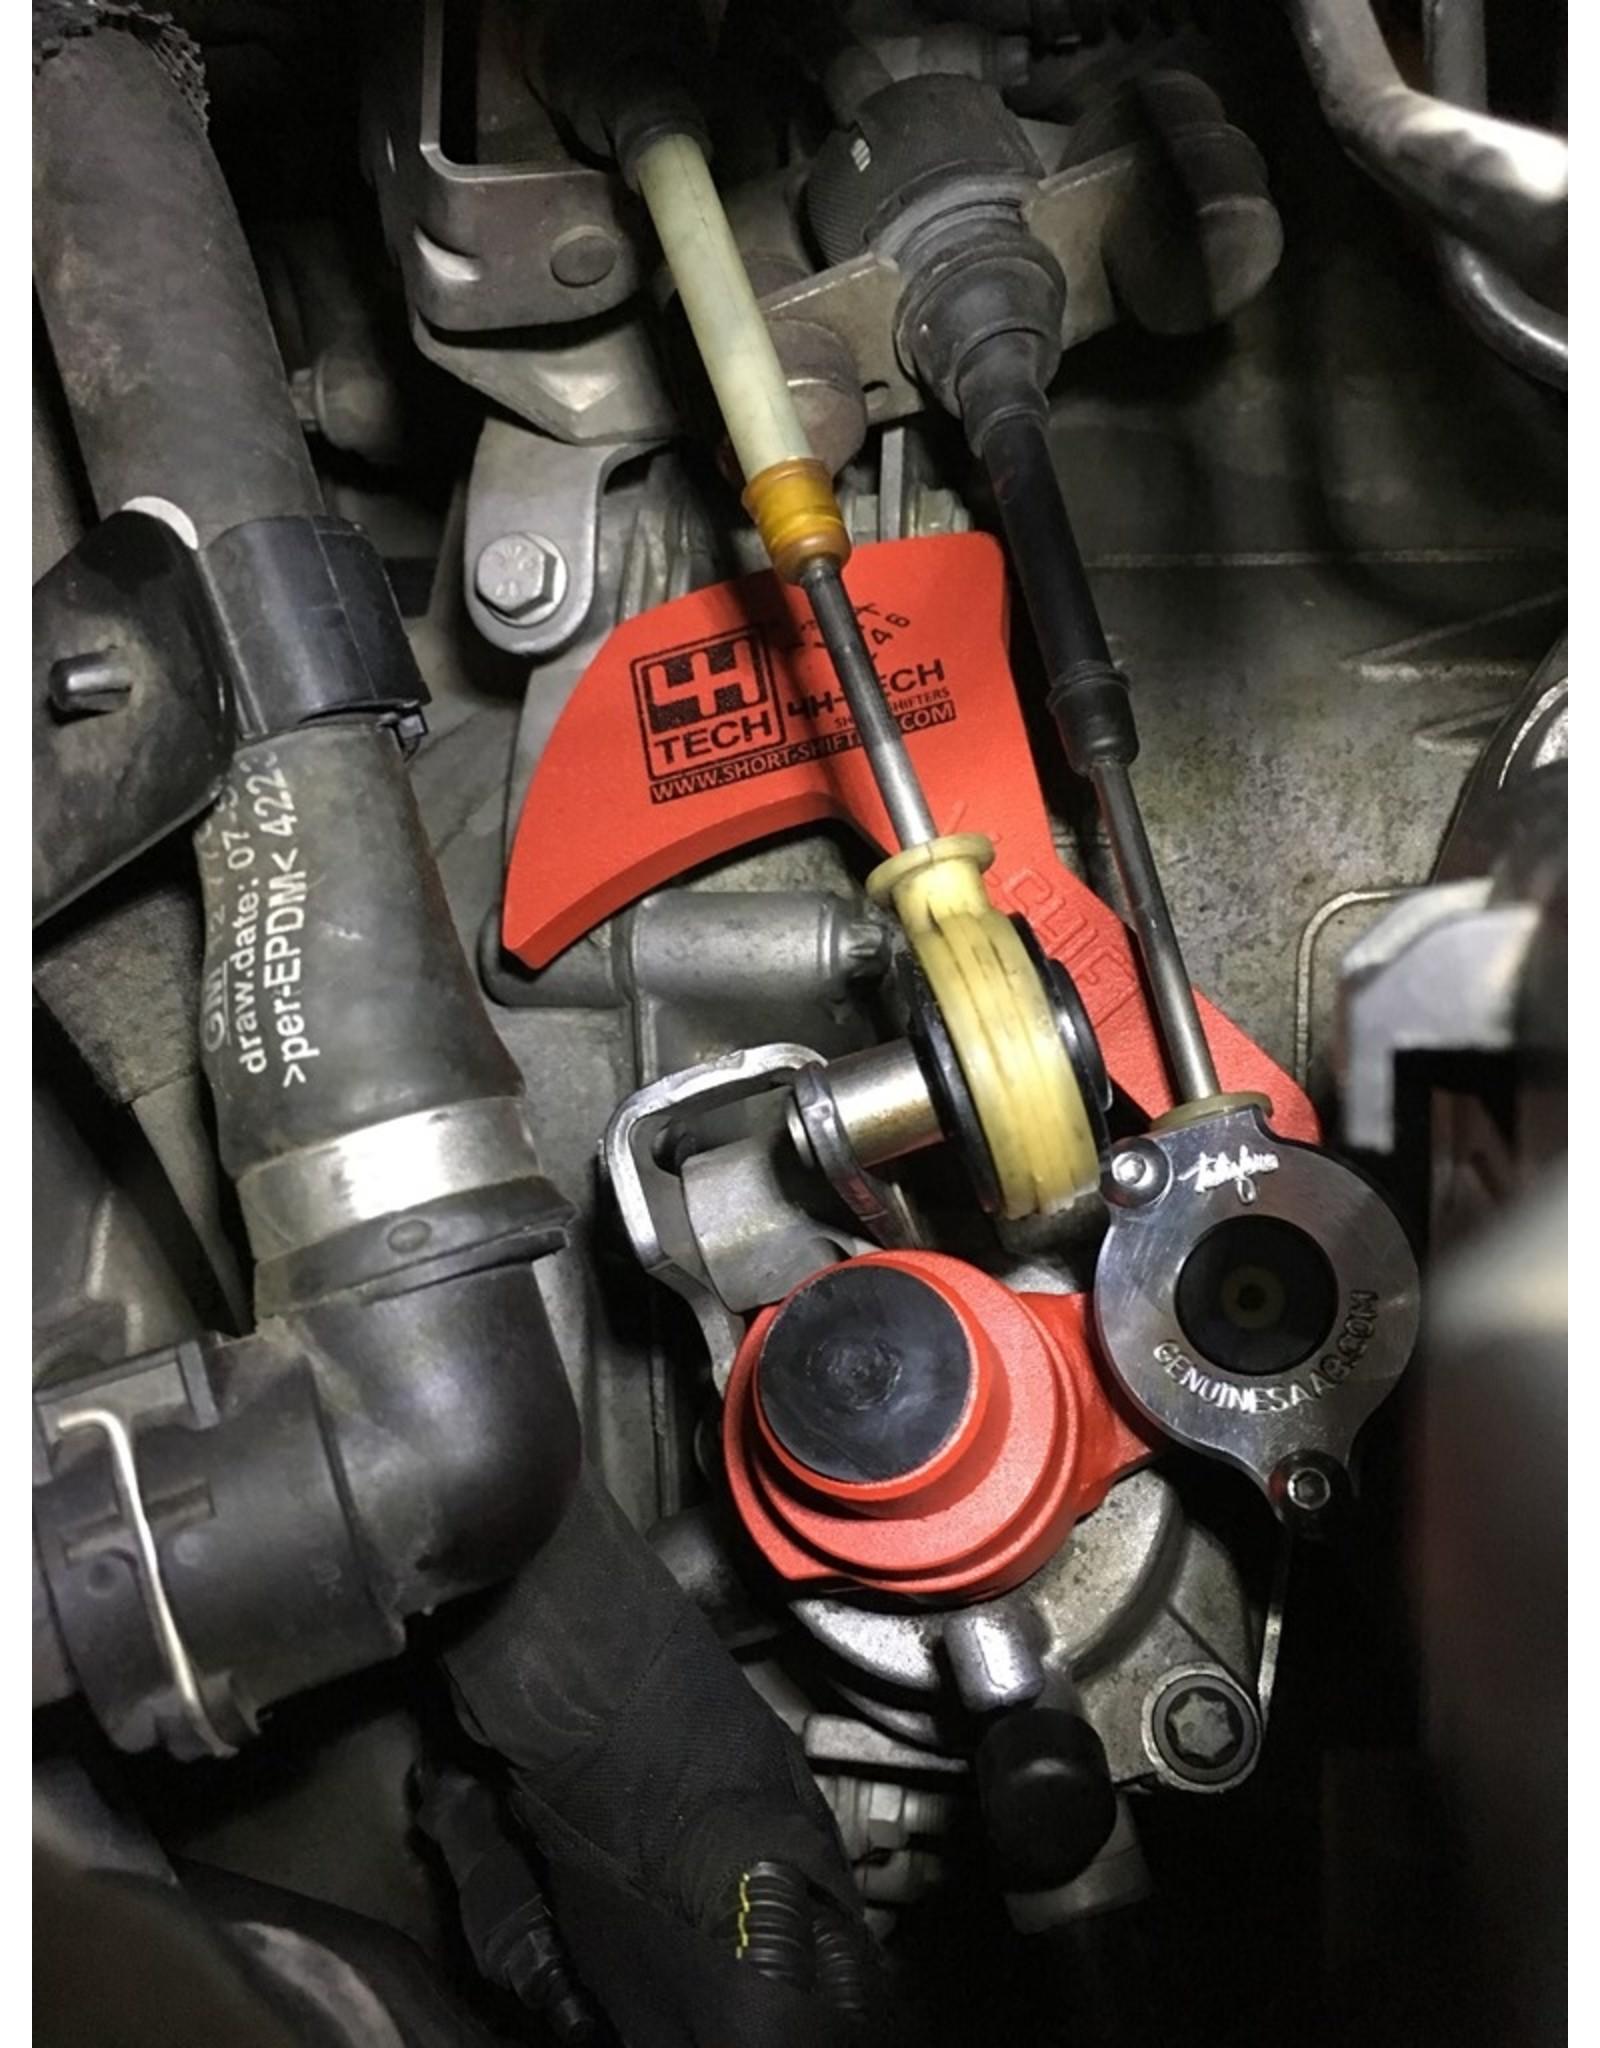 4H-TECH short shifter type V-Shift for the F40 transmissions